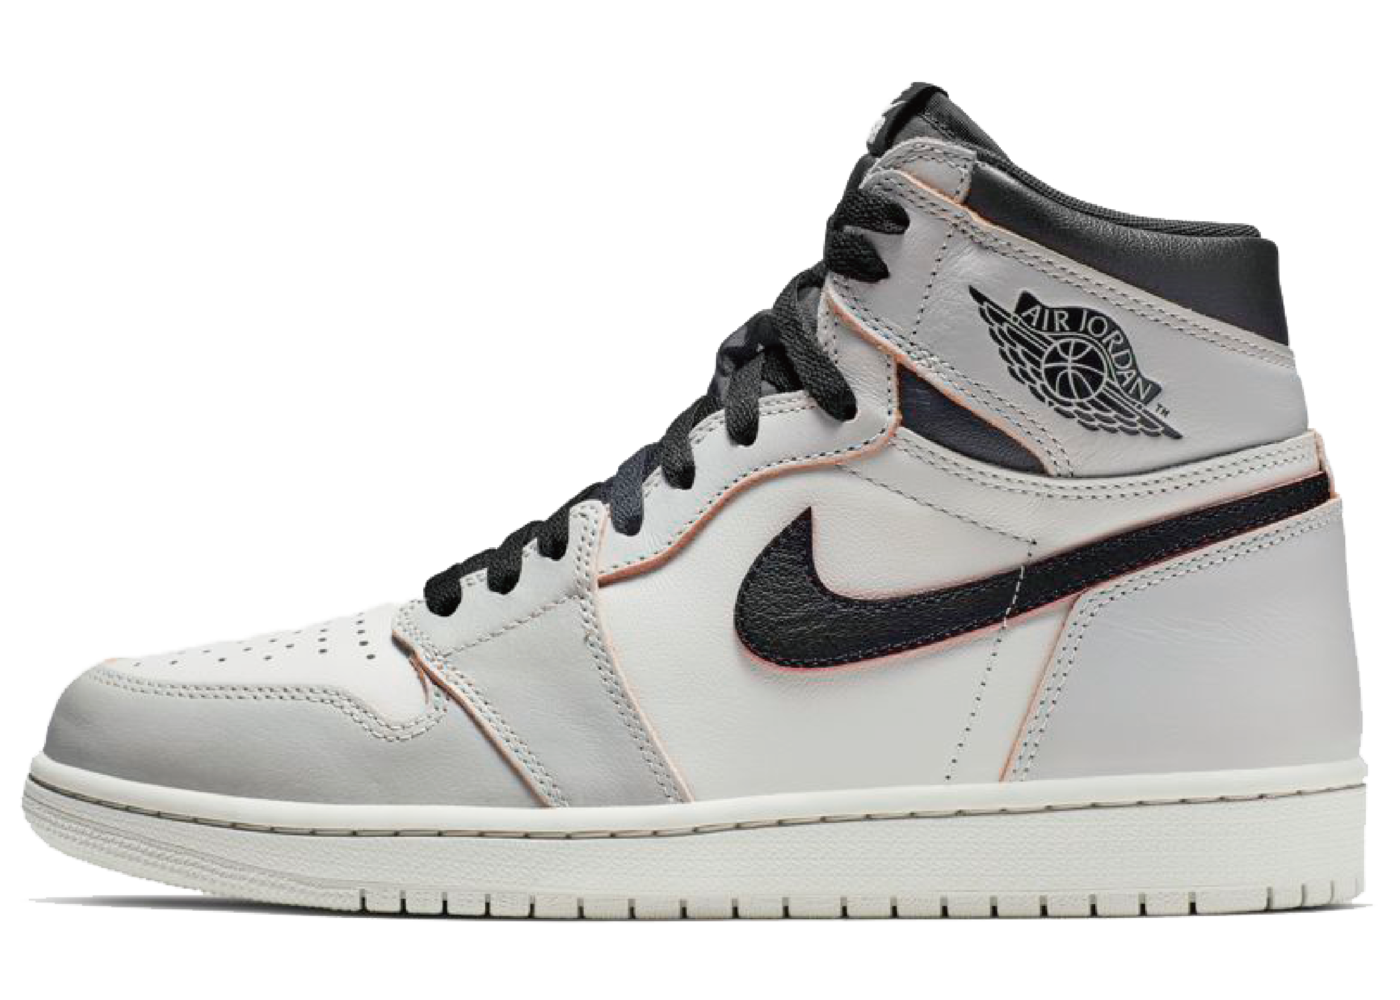 Nike SB Air Jordan 1 NYC to PARIS